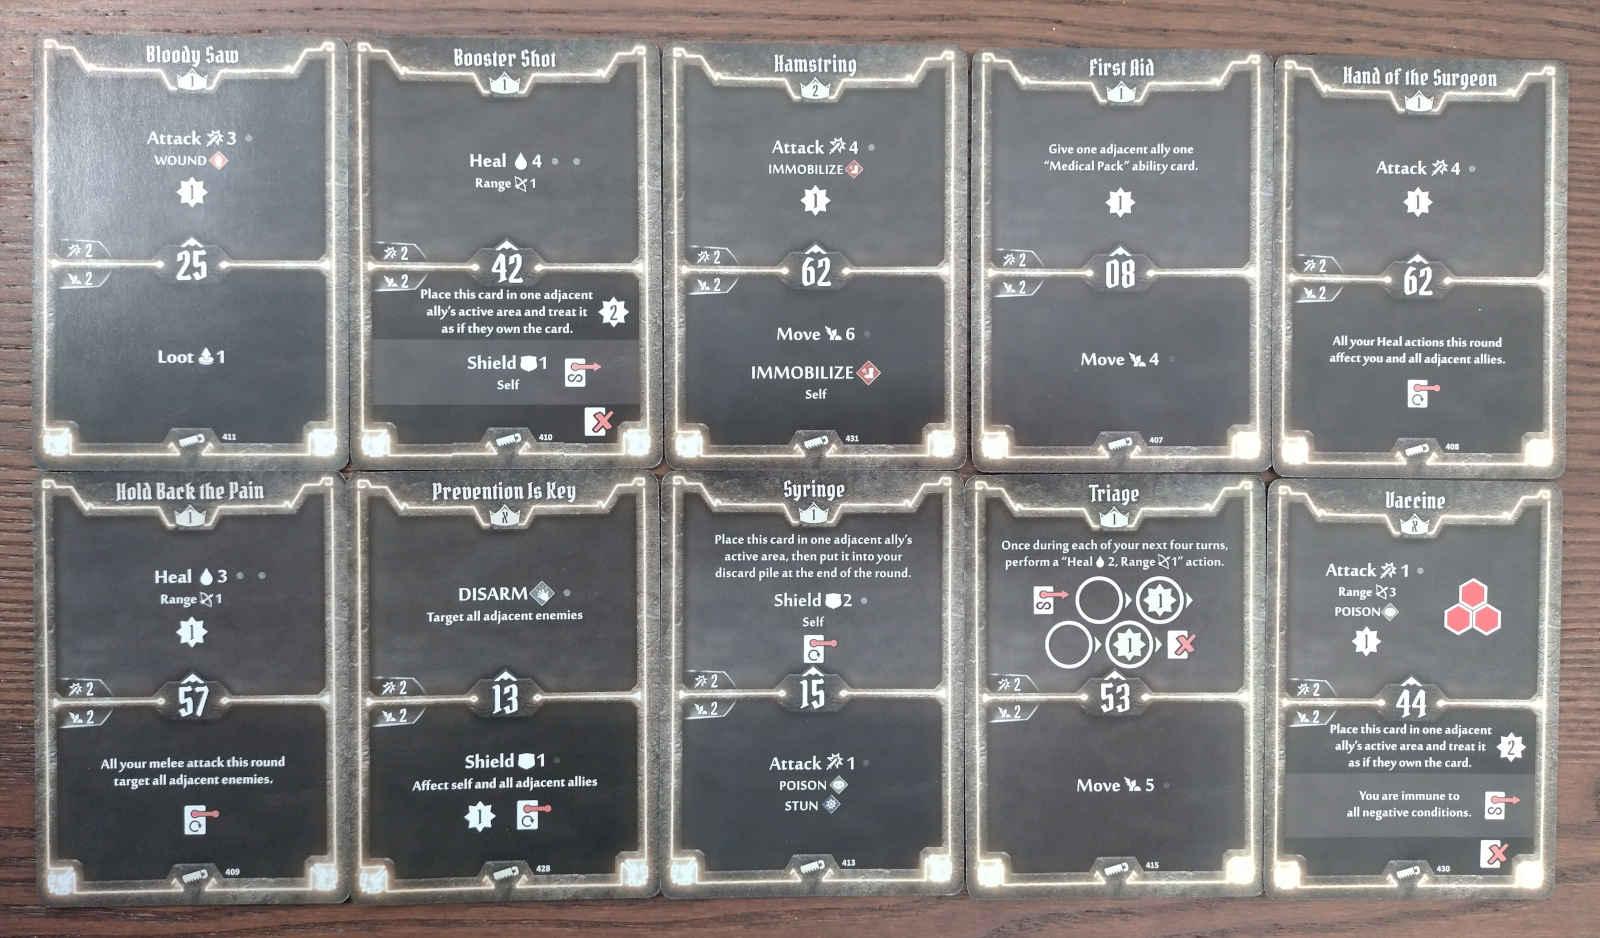 Sawbones level 2 build cards